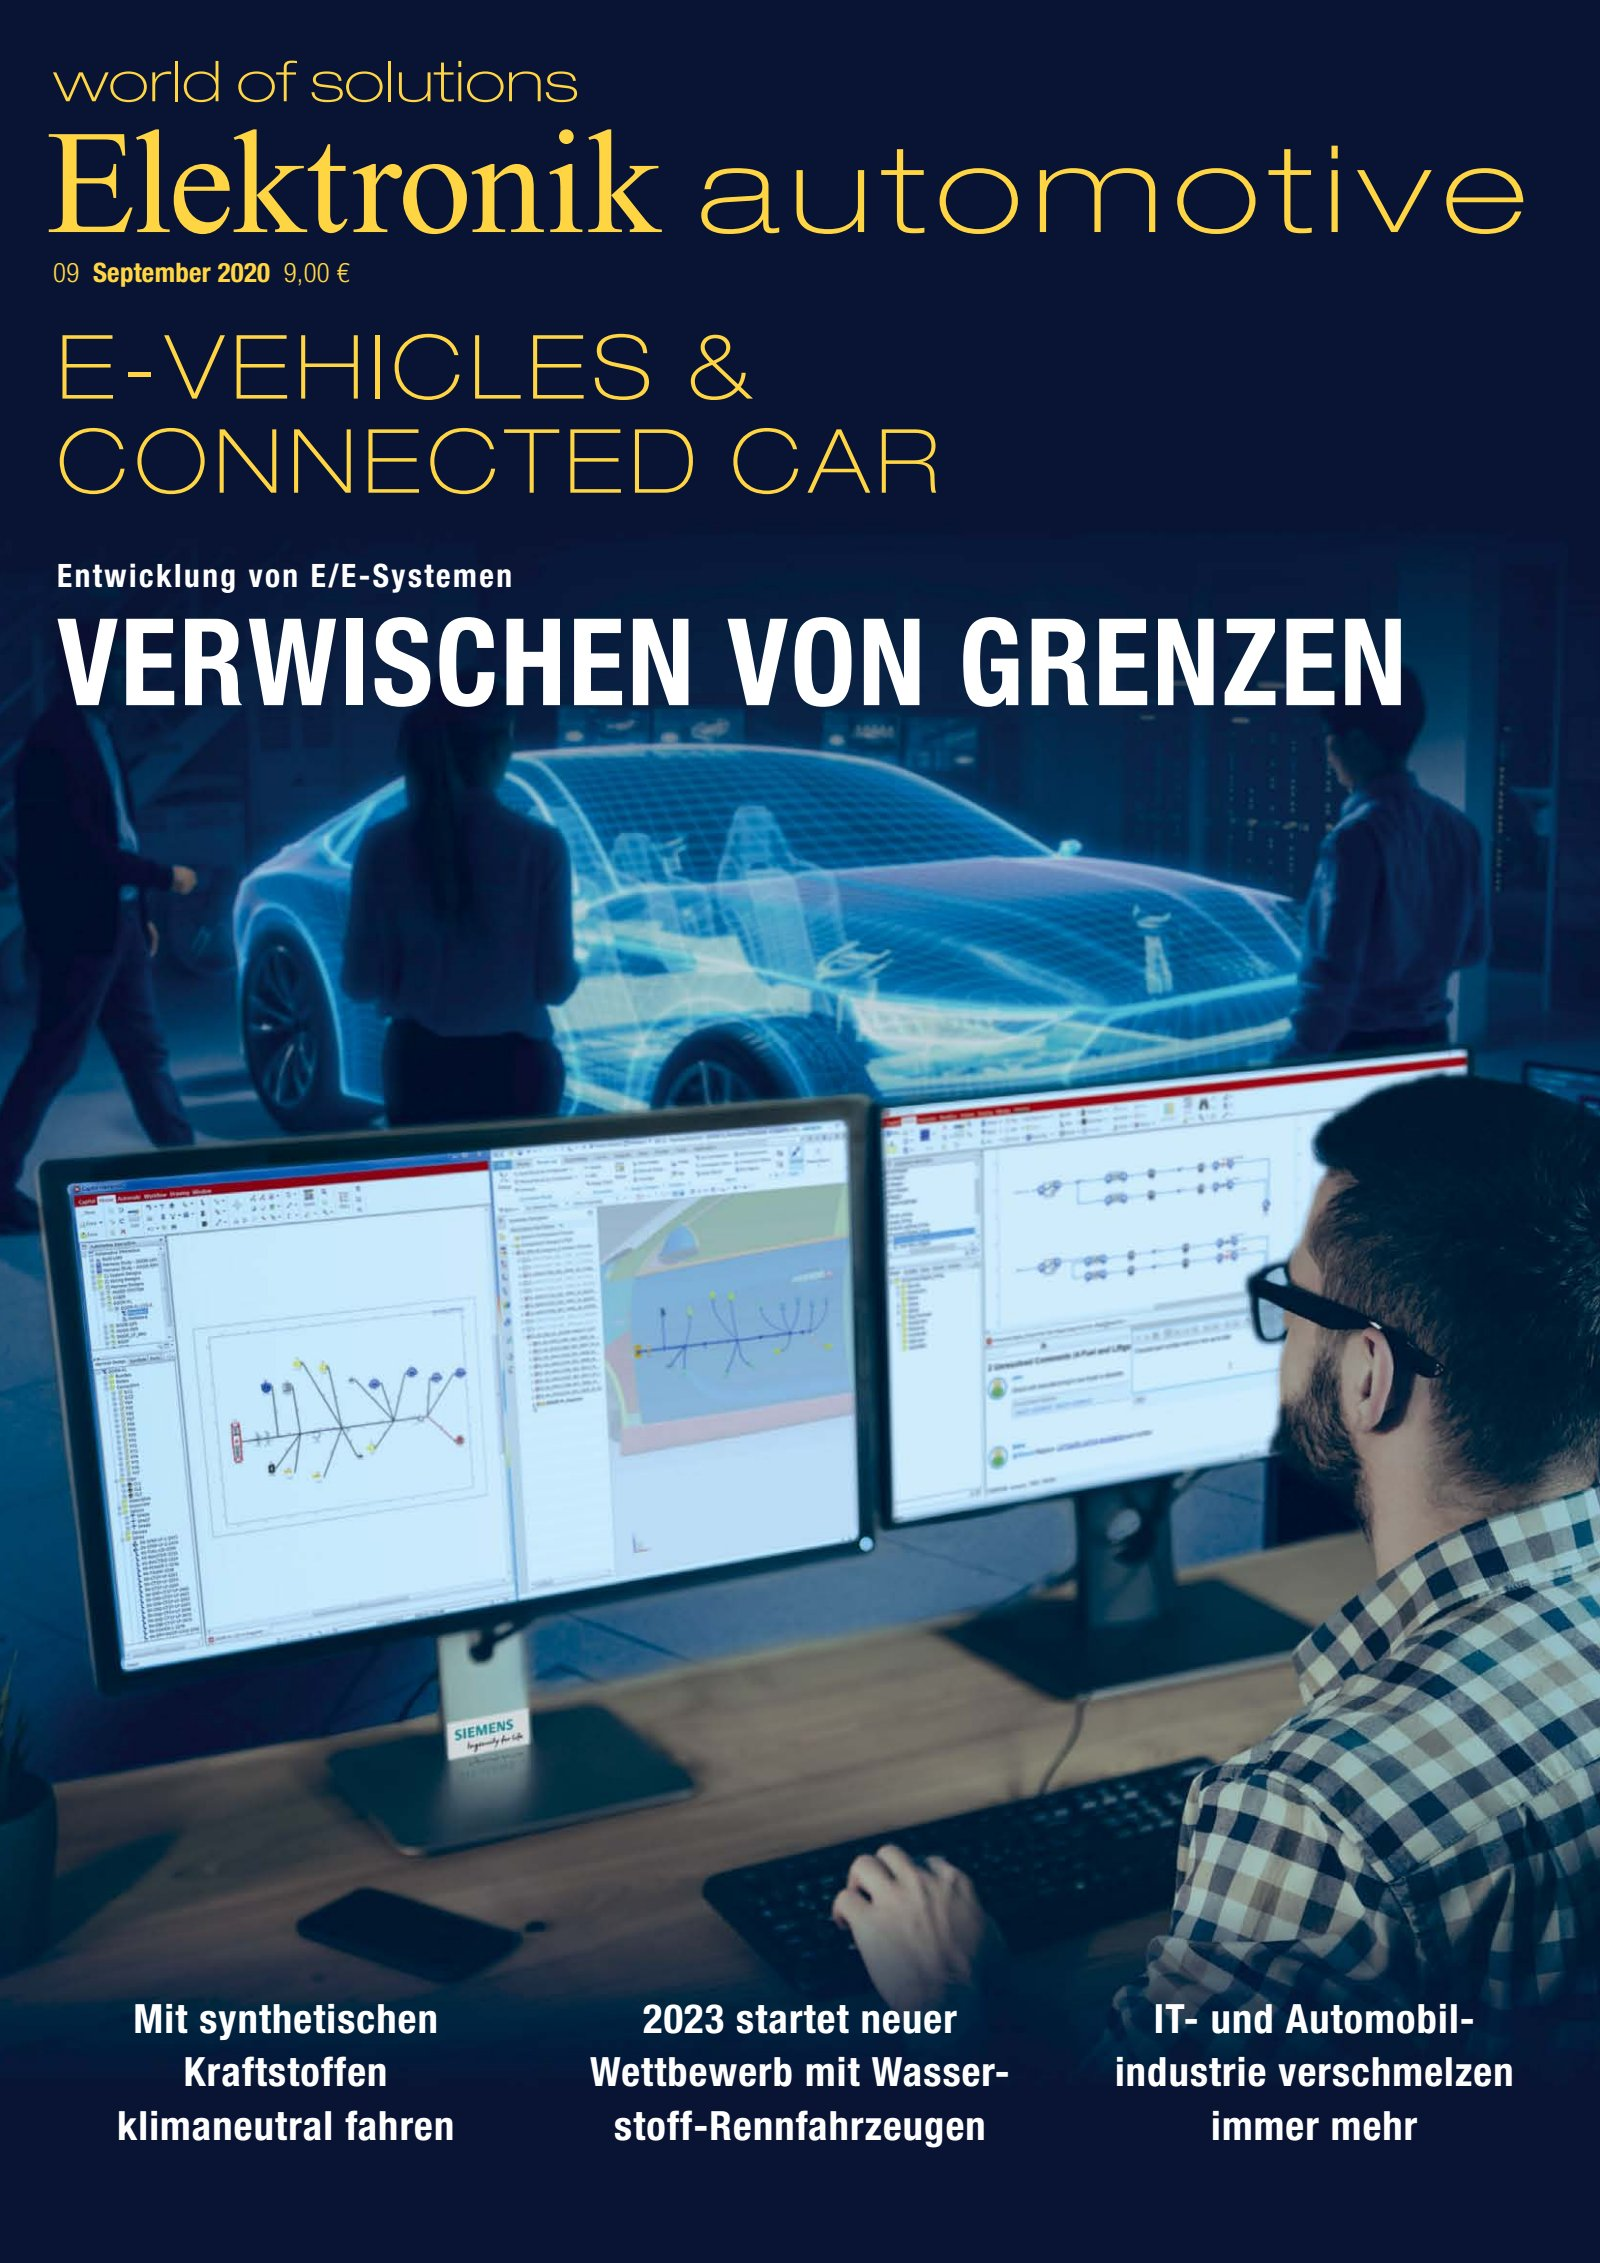 Elektronik automotive 09/2020 Digital